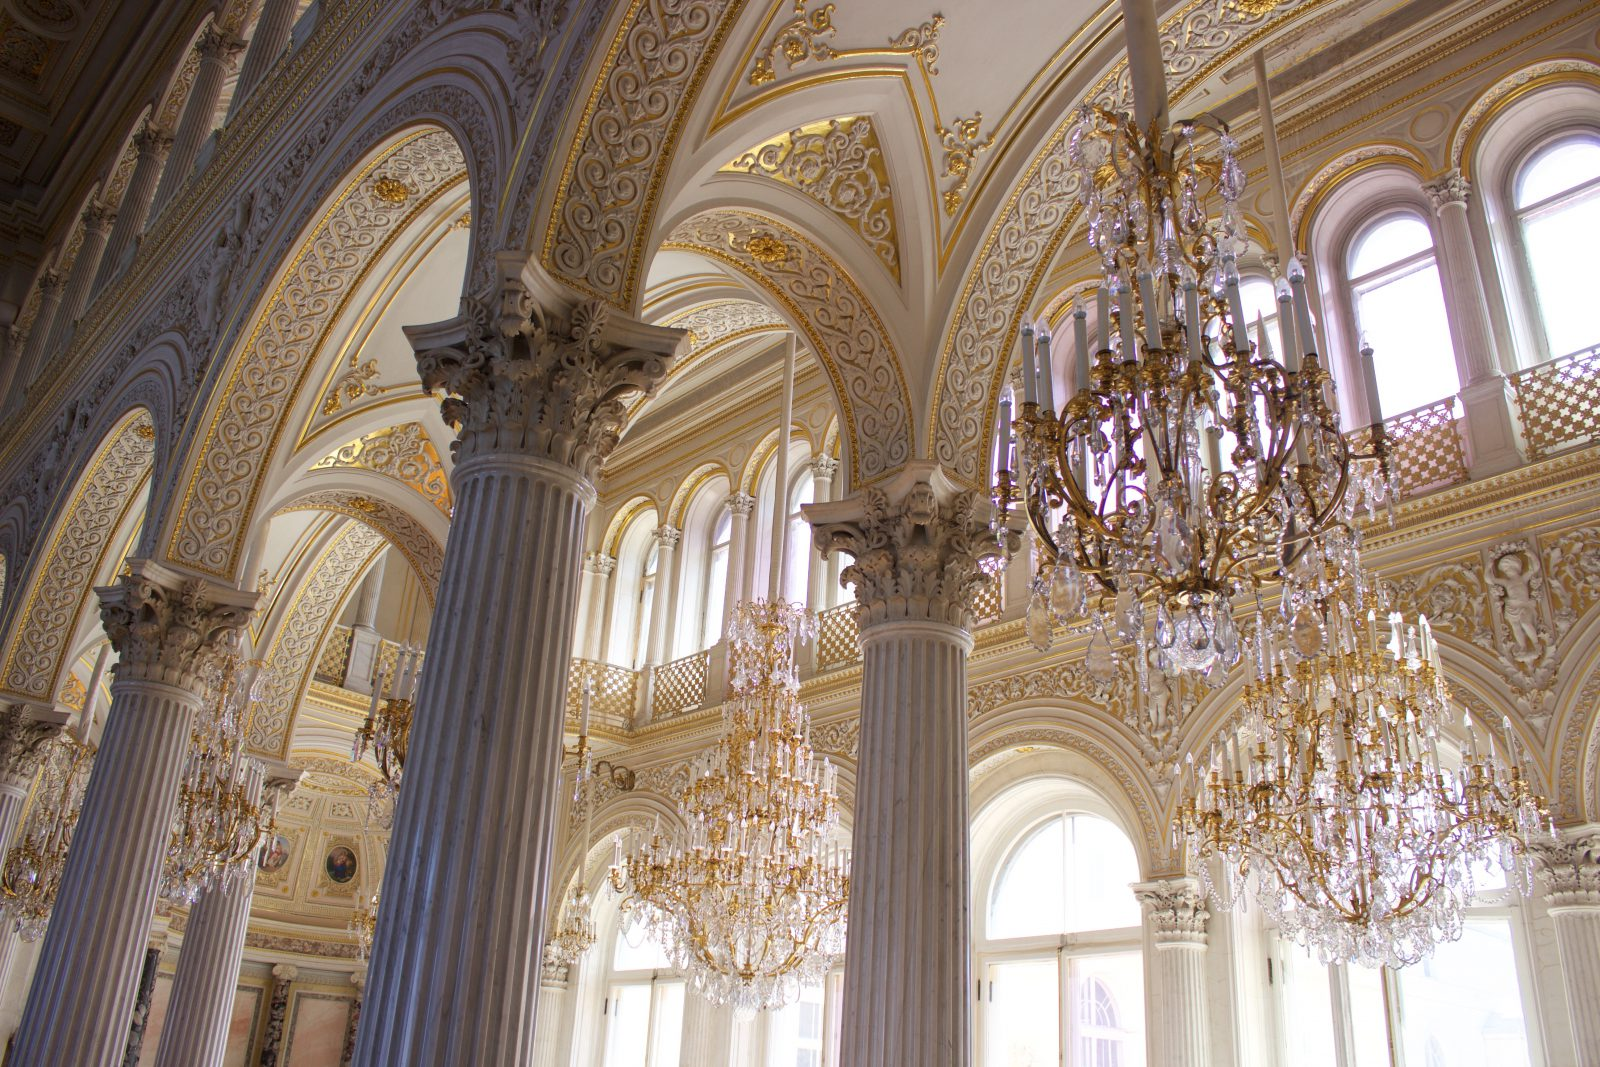 Saint Petersbourg Ermitage Lustres et dorures